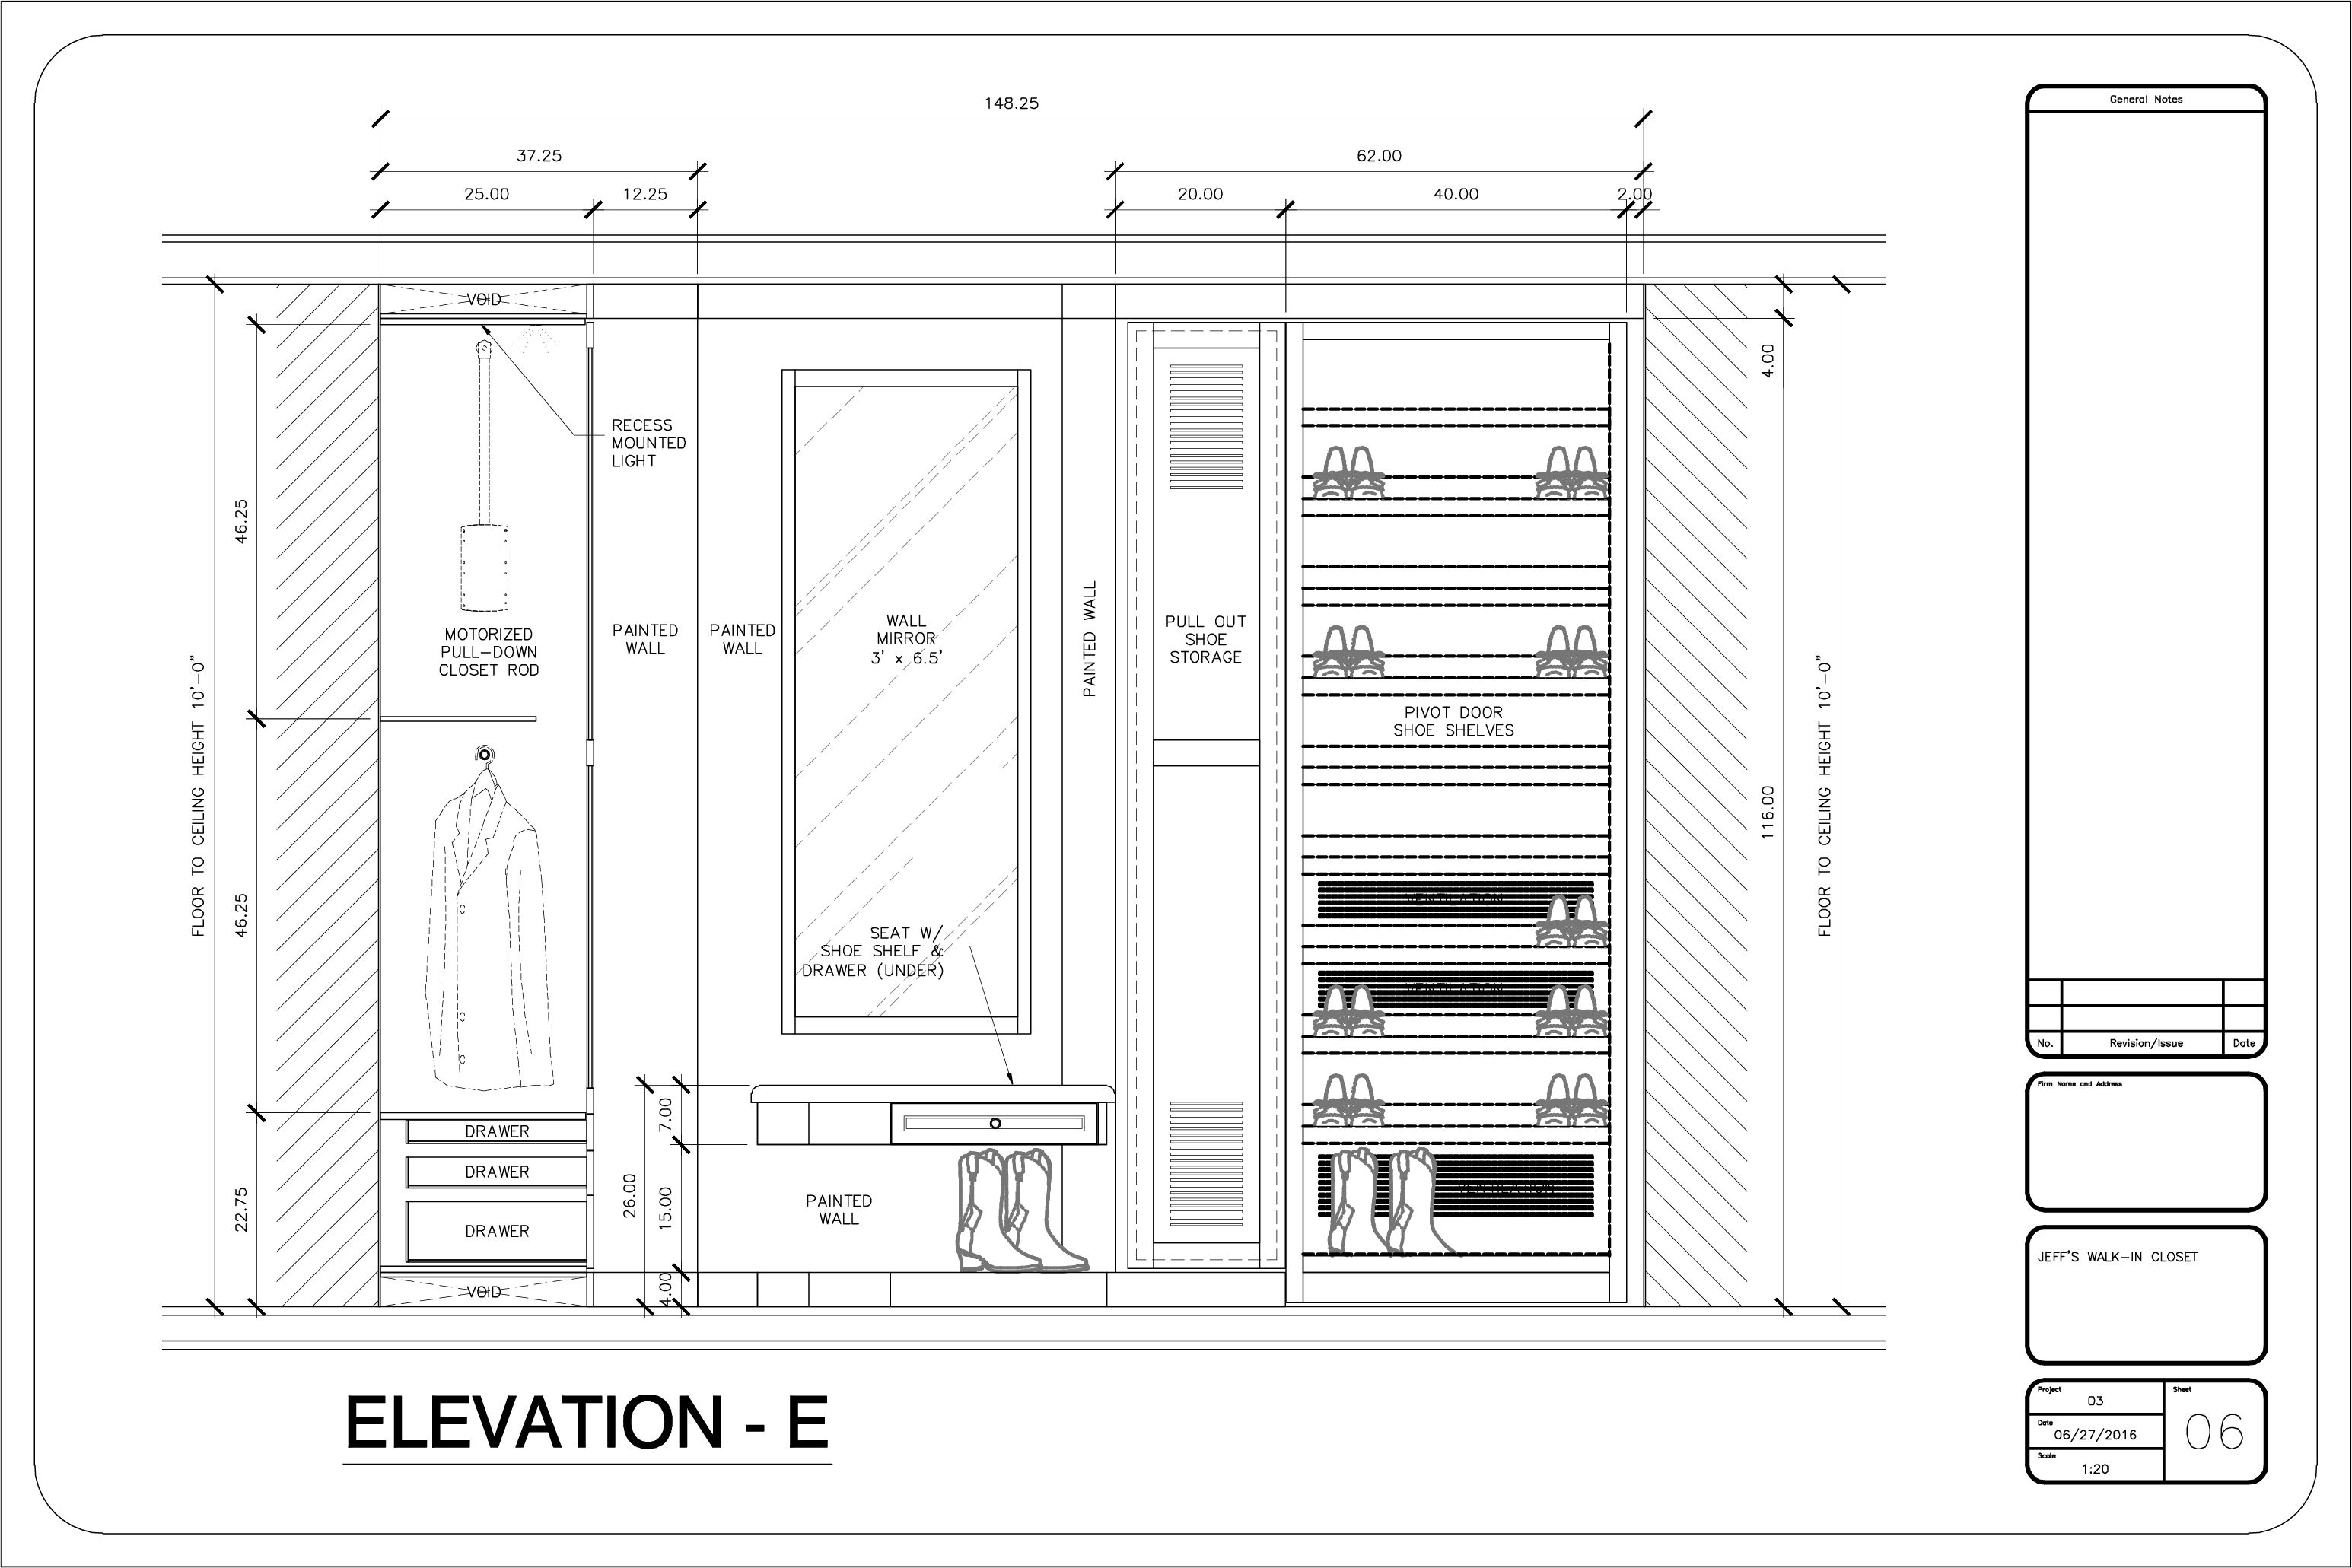 Elevation E Floor Plans Elevation Walk In Closet